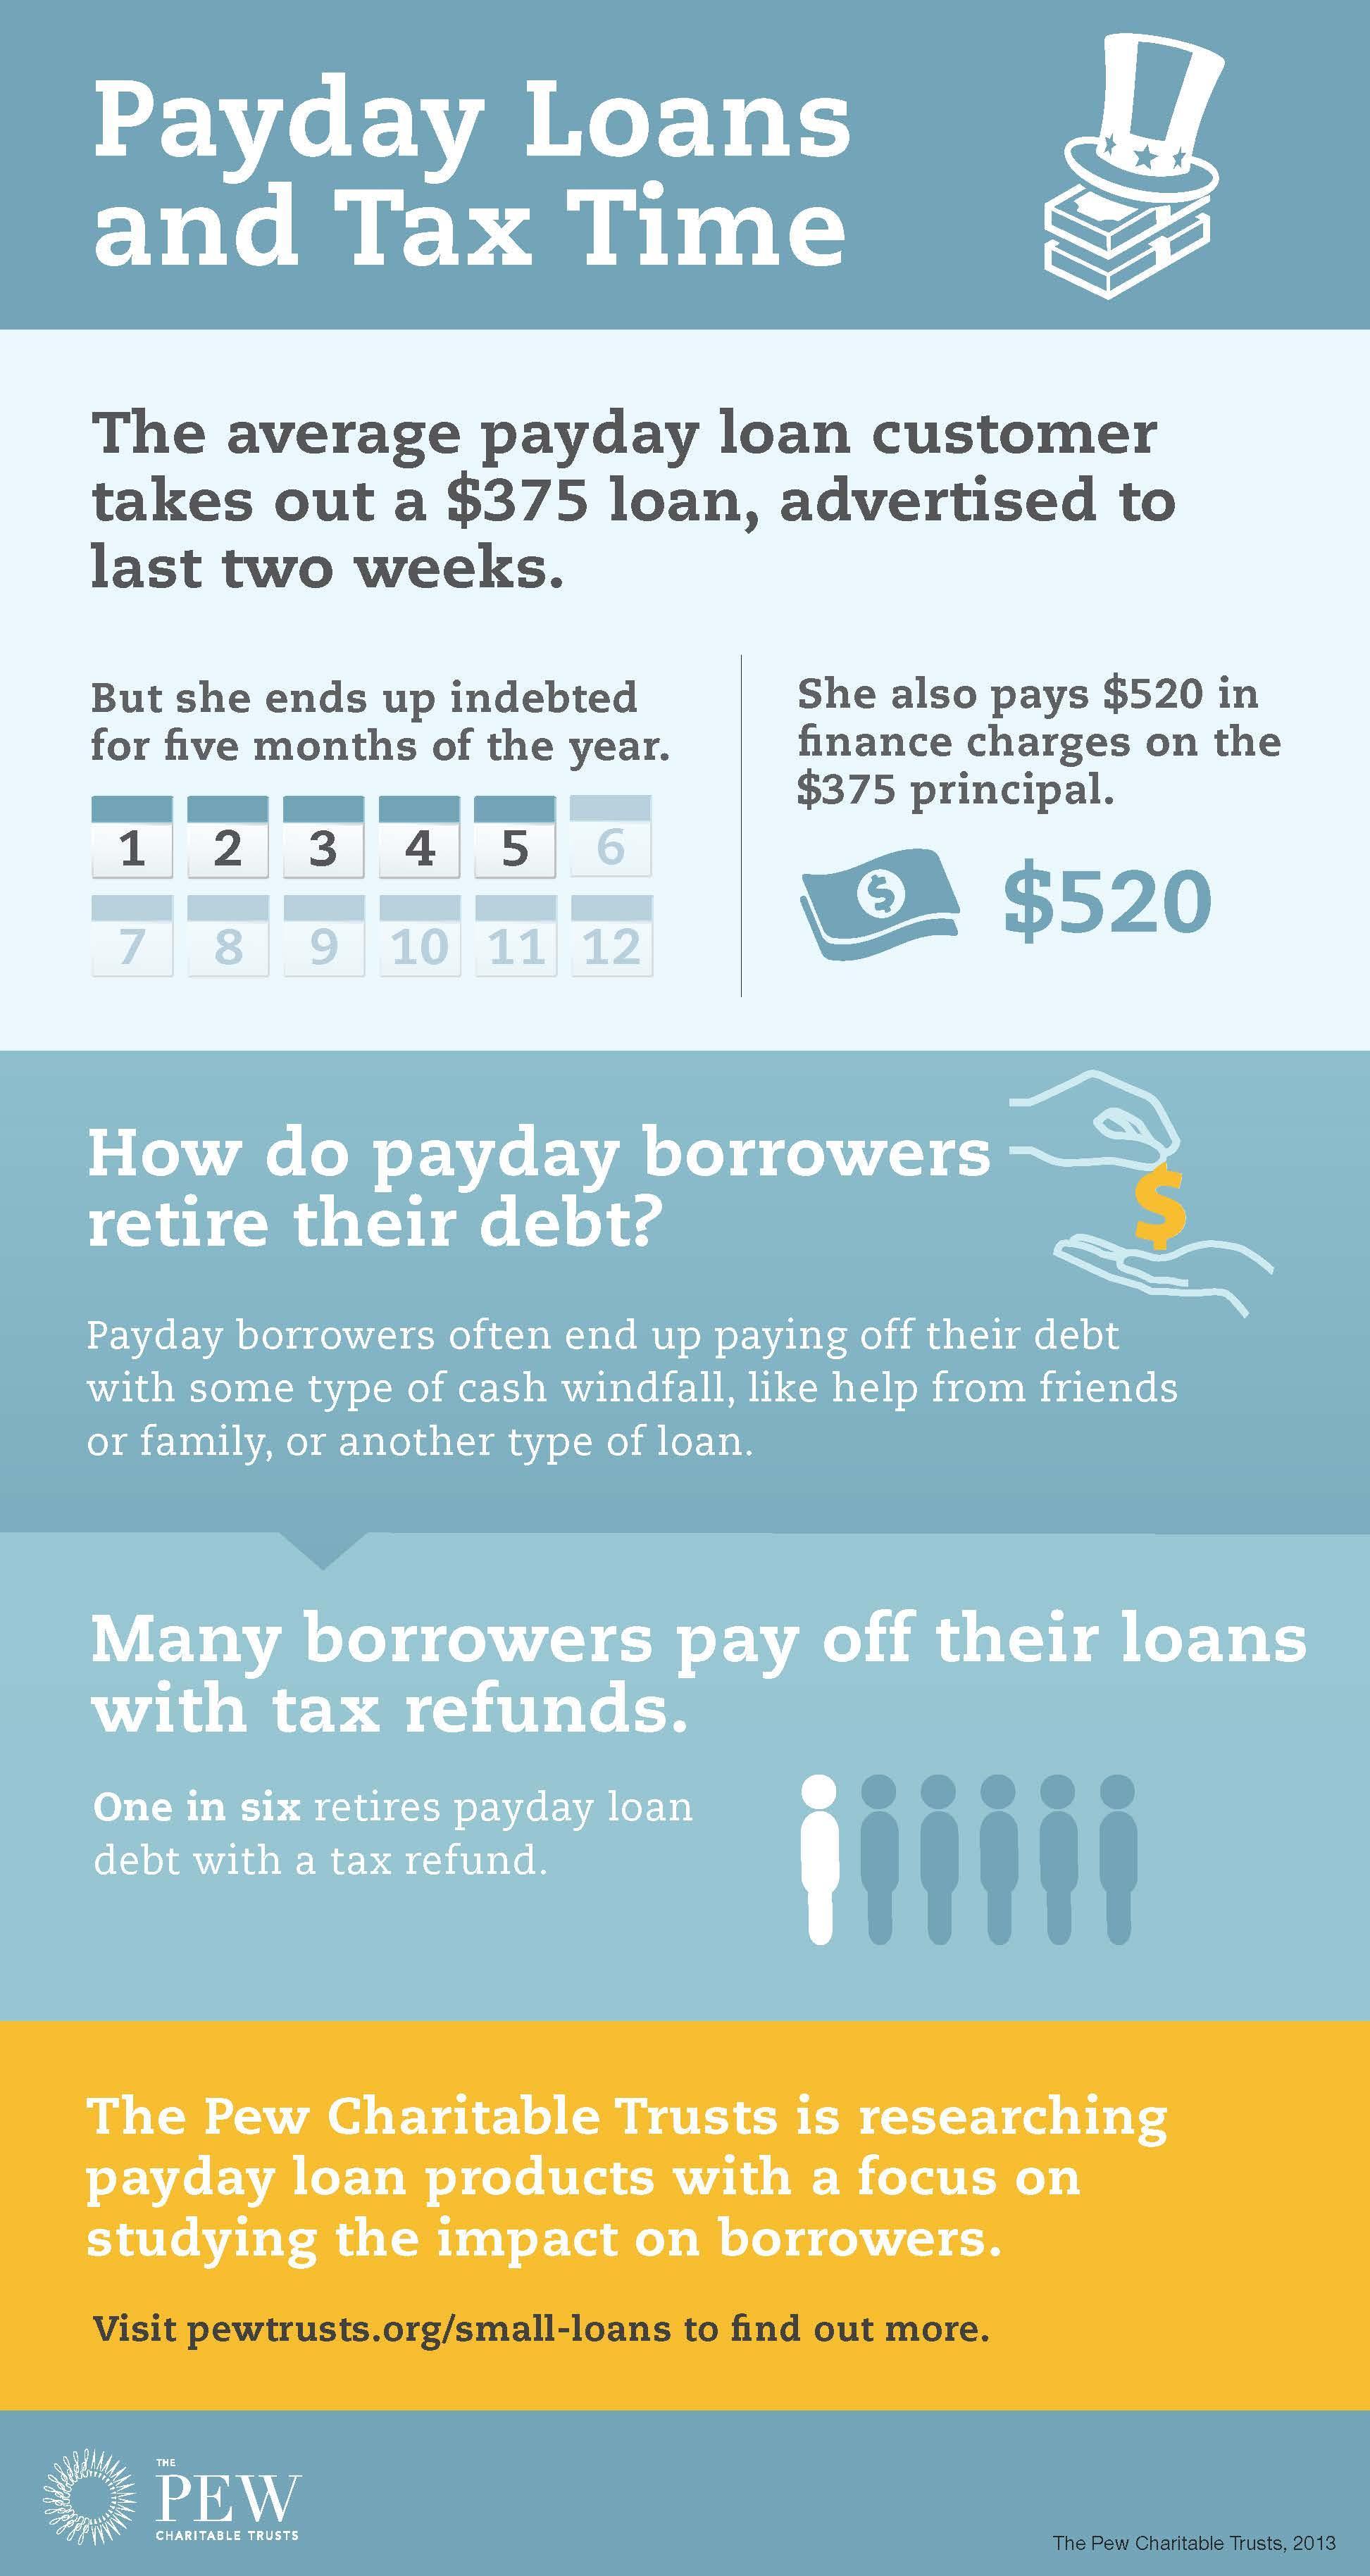 My big fat payday loan image 10